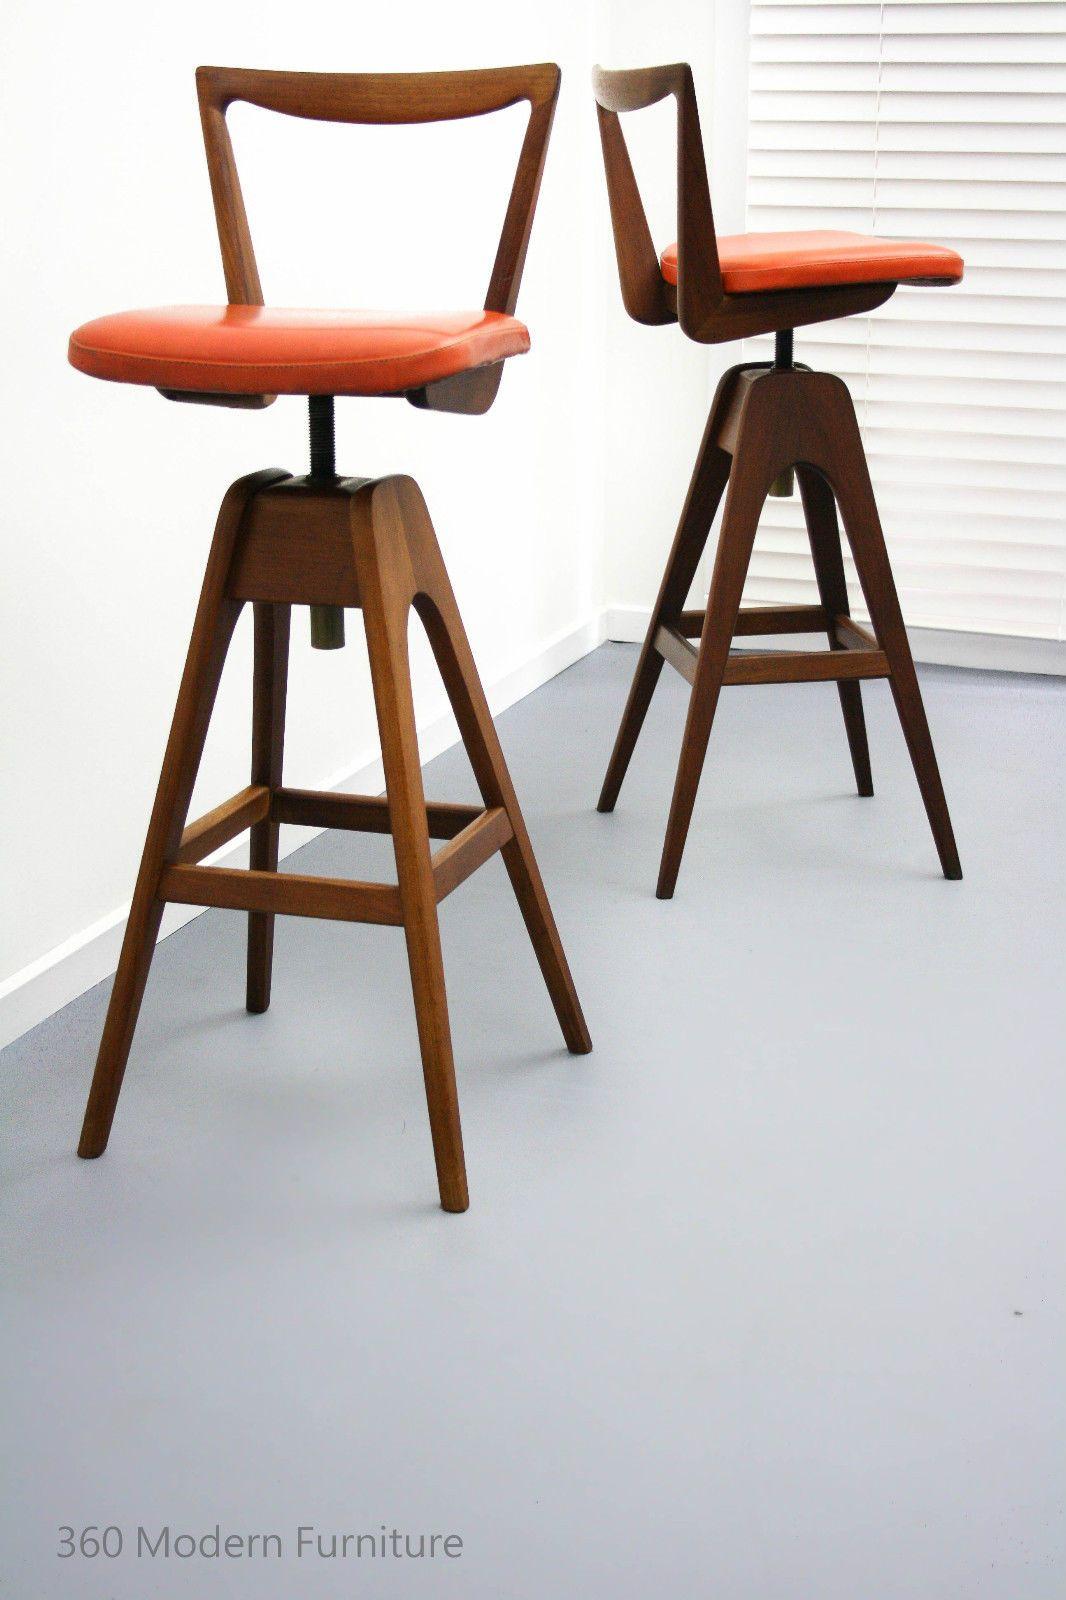 Mid century x 2 th brown swivel bar bench stools retro vintage danish scandi era in